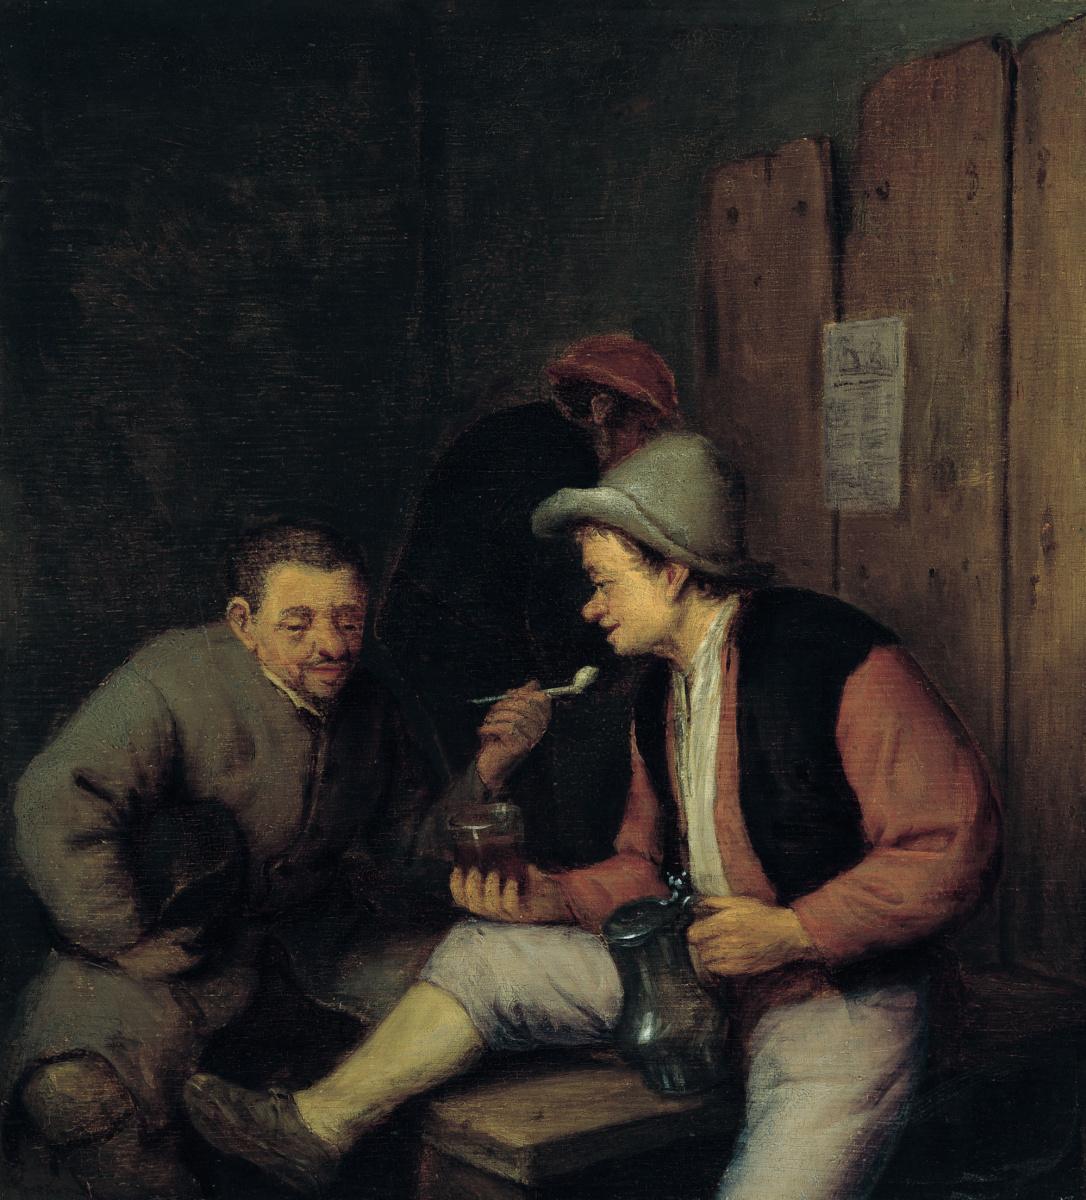 Adrian Jans van Ostade. Smoking and drinking peasants in a tavern